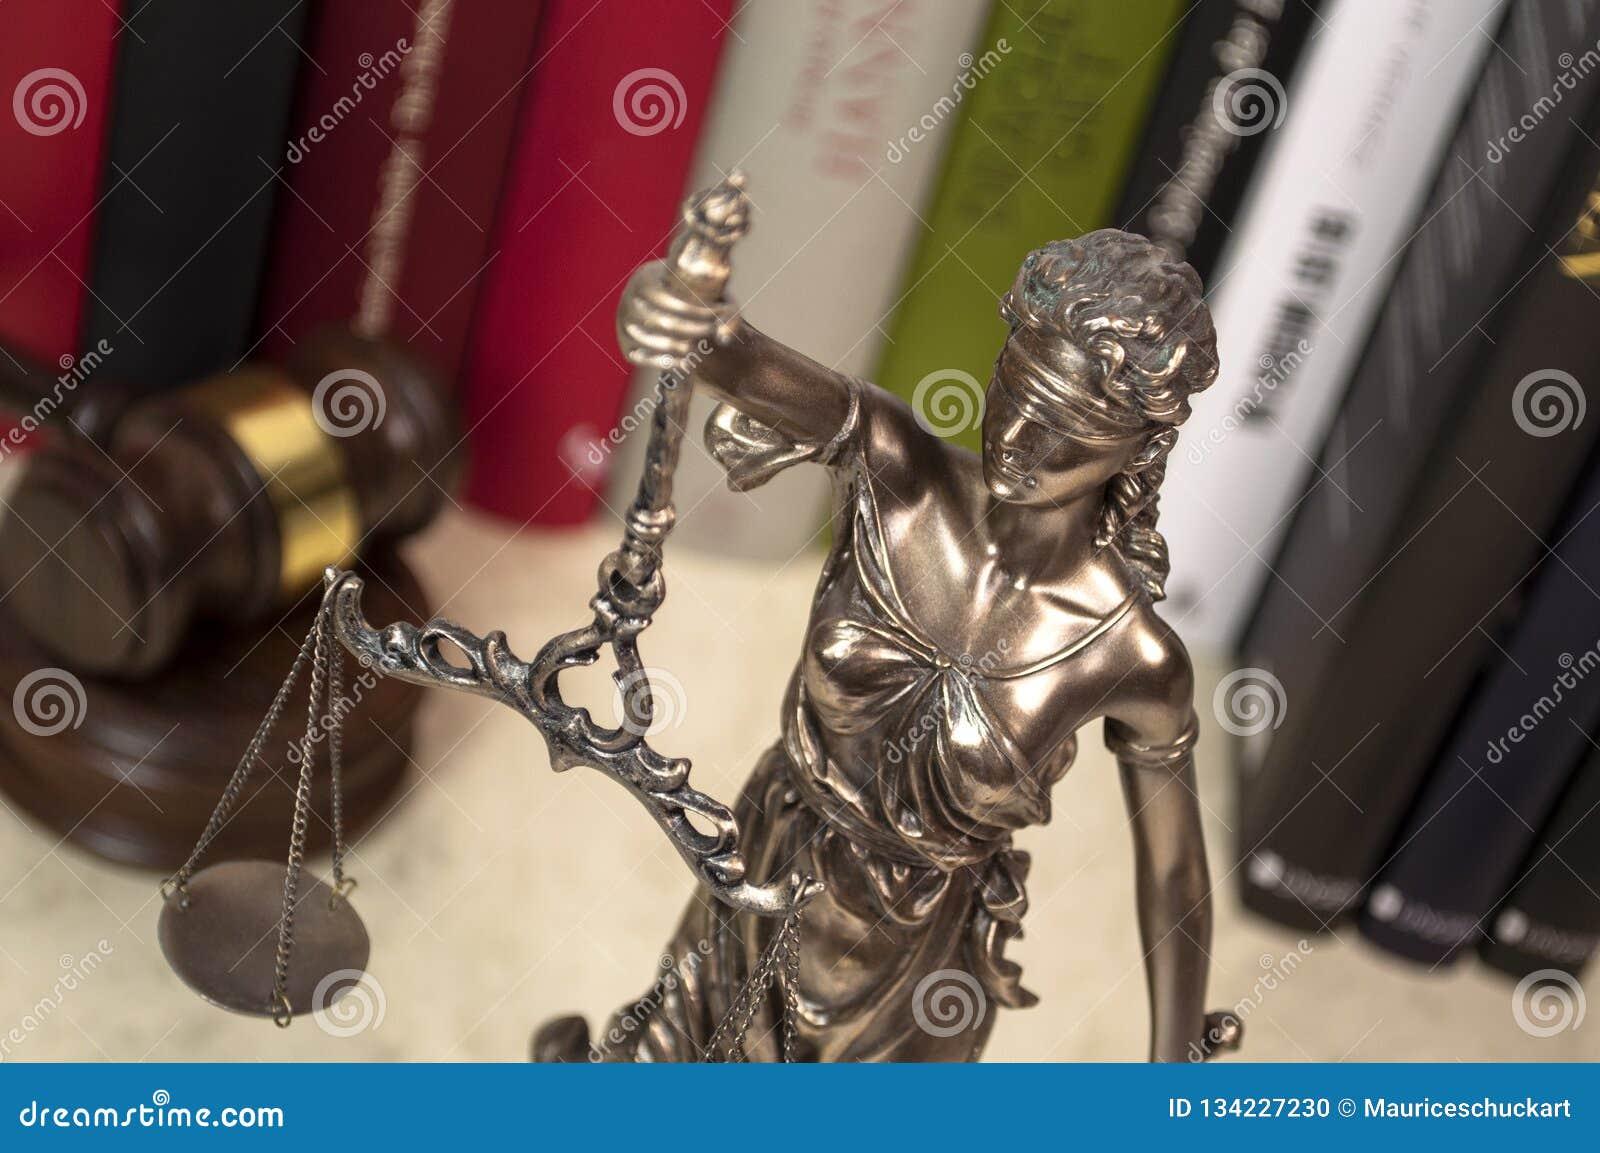 Статуя правосудия на столе